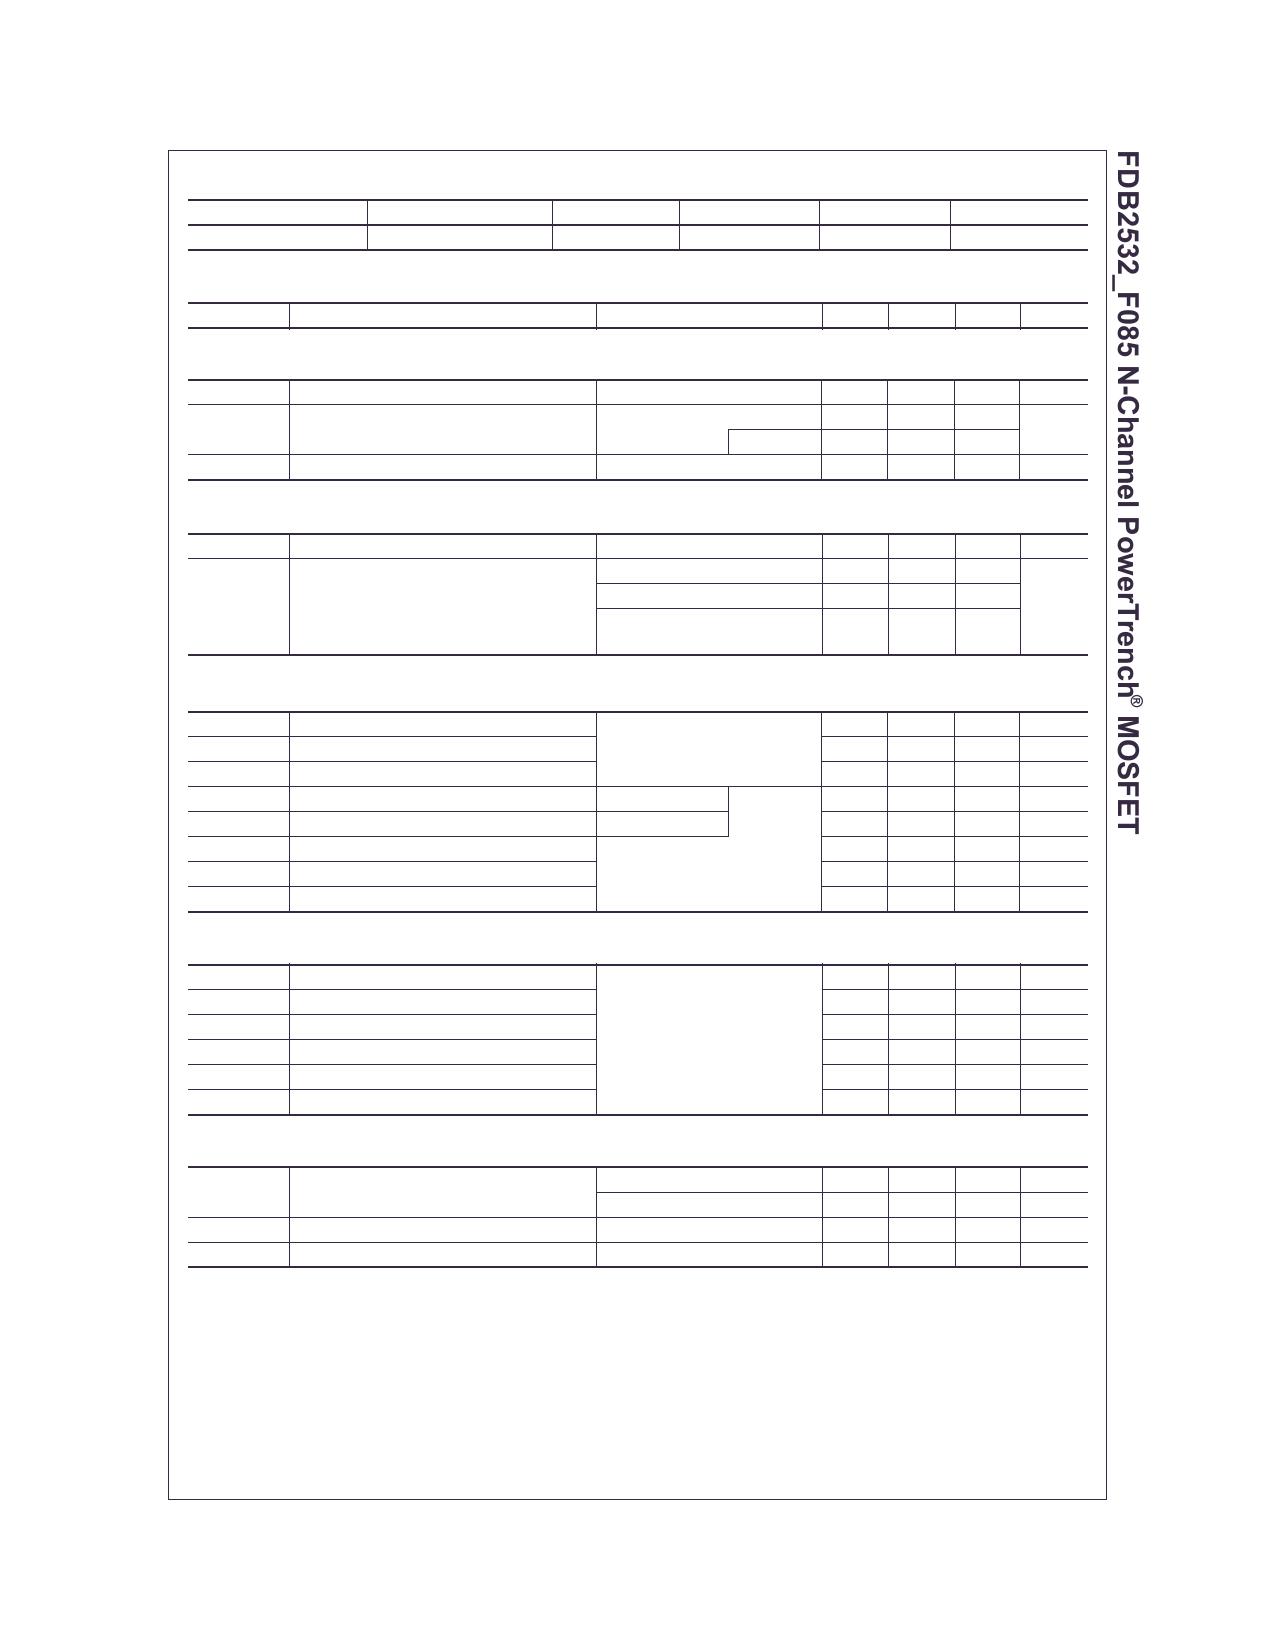 FDB2532_F085 pdf, equivalent, schematic